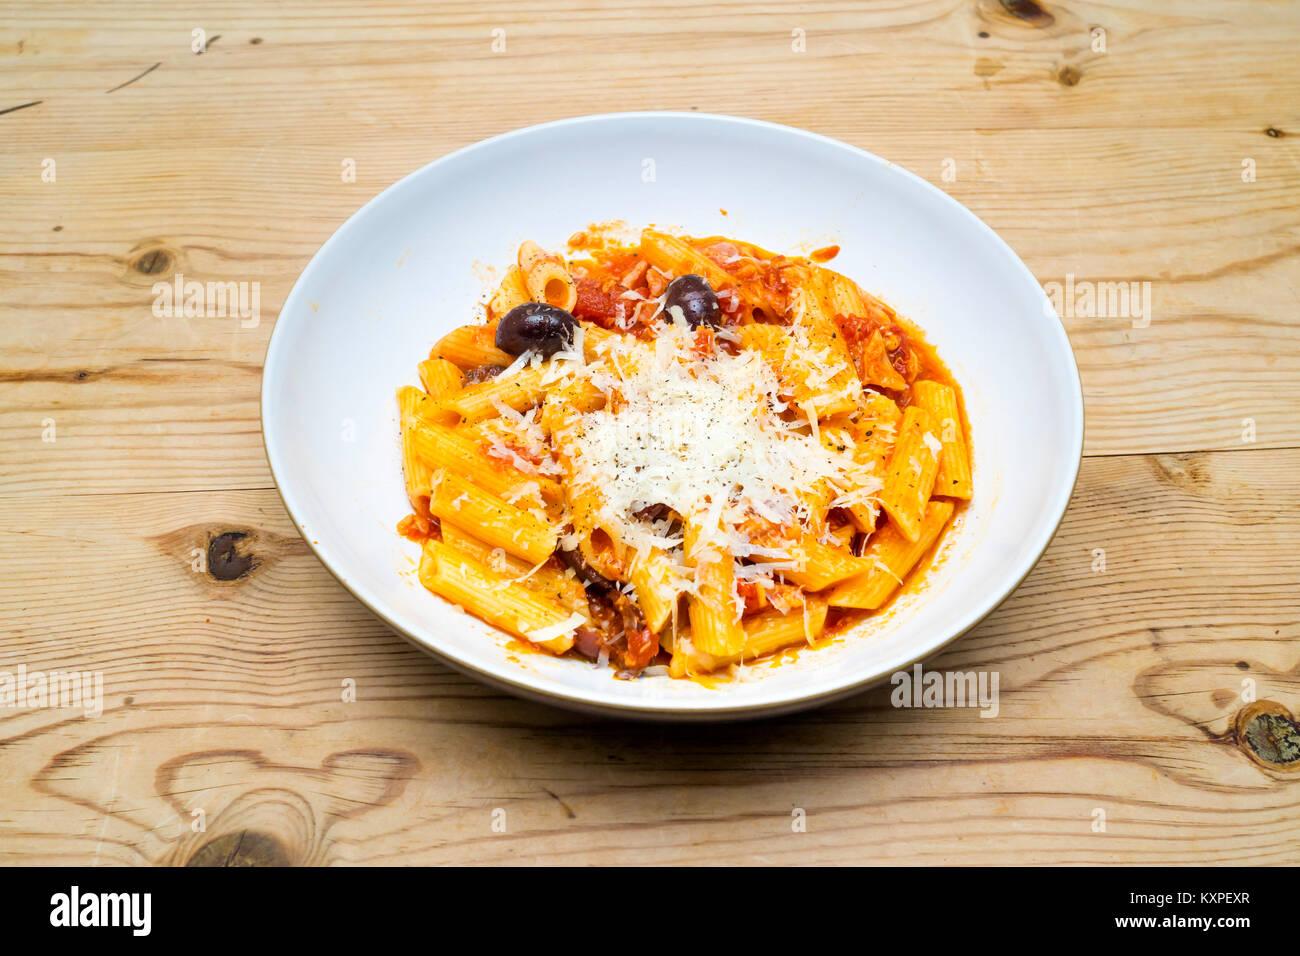 Food Penne Pasta Tonno made with tuna, bacon, tomatoes and Basil, Kalamata Olives, and Pecorino Romano grated cheese - Stock Image